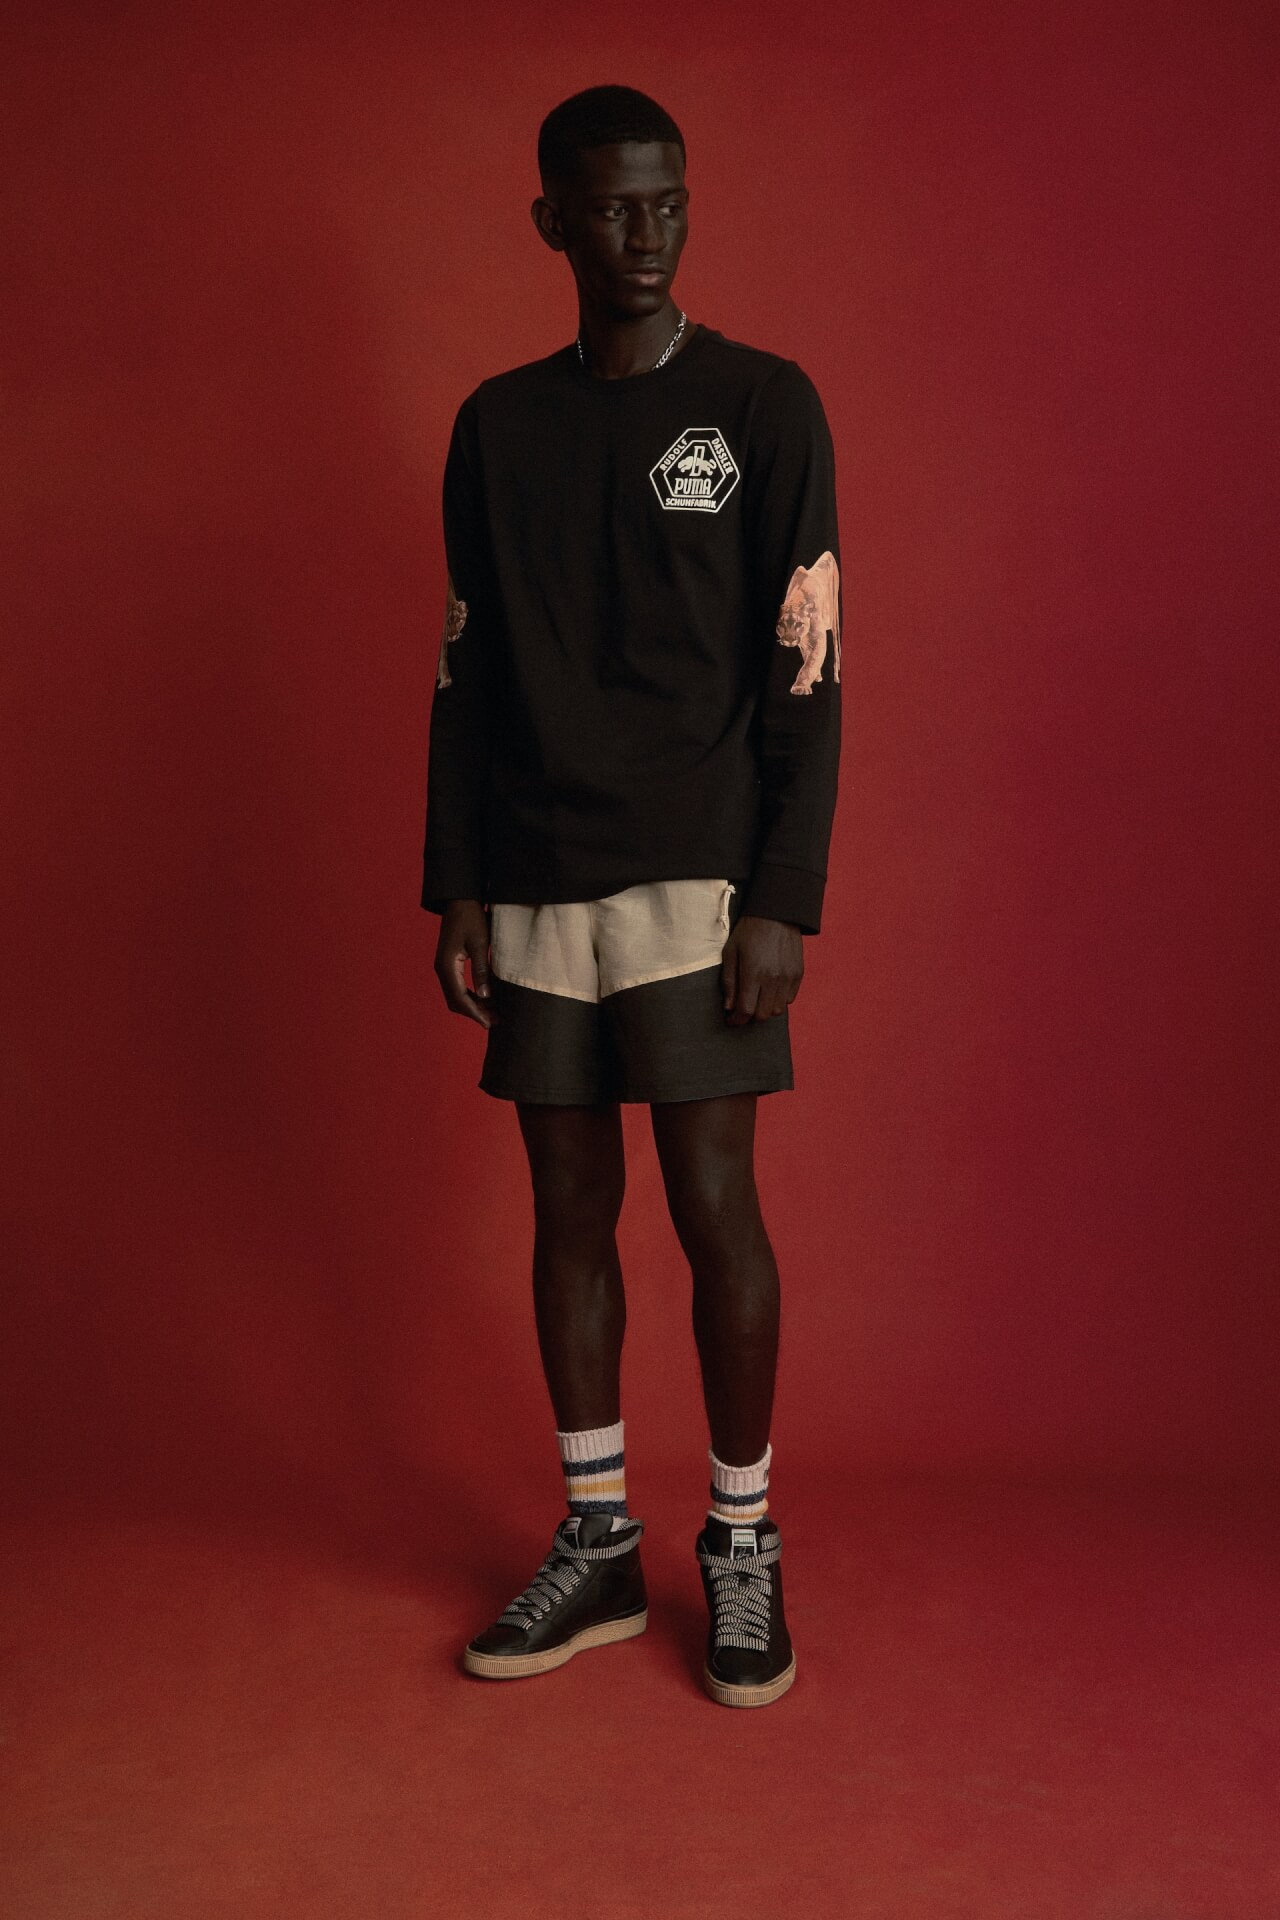 LA発ストリートブランドRHUDEとPUMAによるコラボレーションアイテムが新登場!「PUMA SUEDE」の新モデルも本日発売 Fashion10617_PUMA9